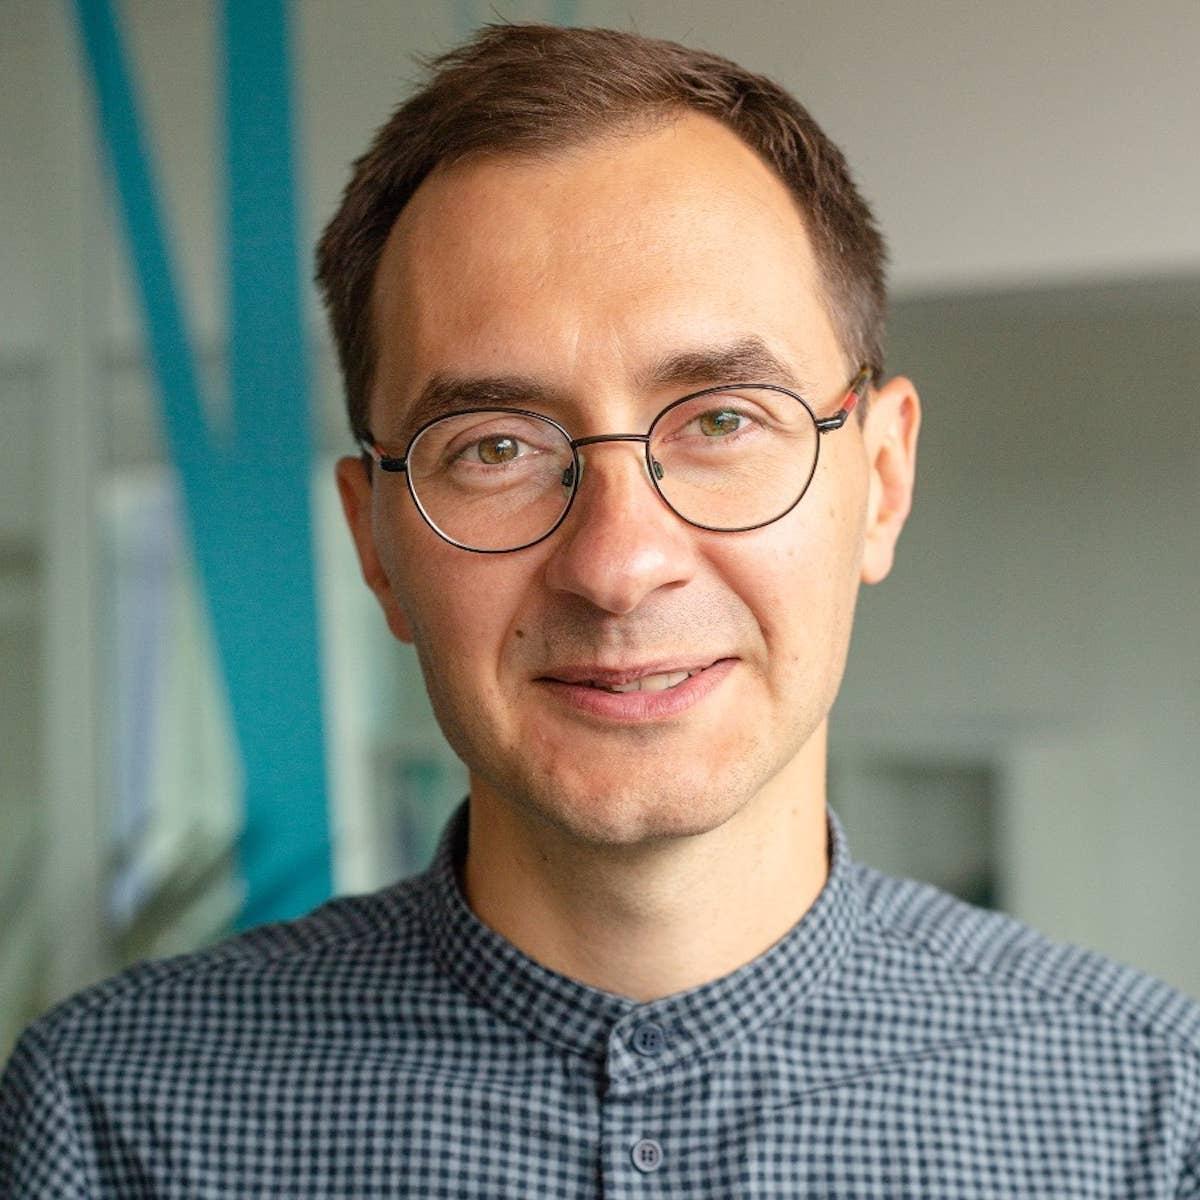 Daivaras Ulinskas